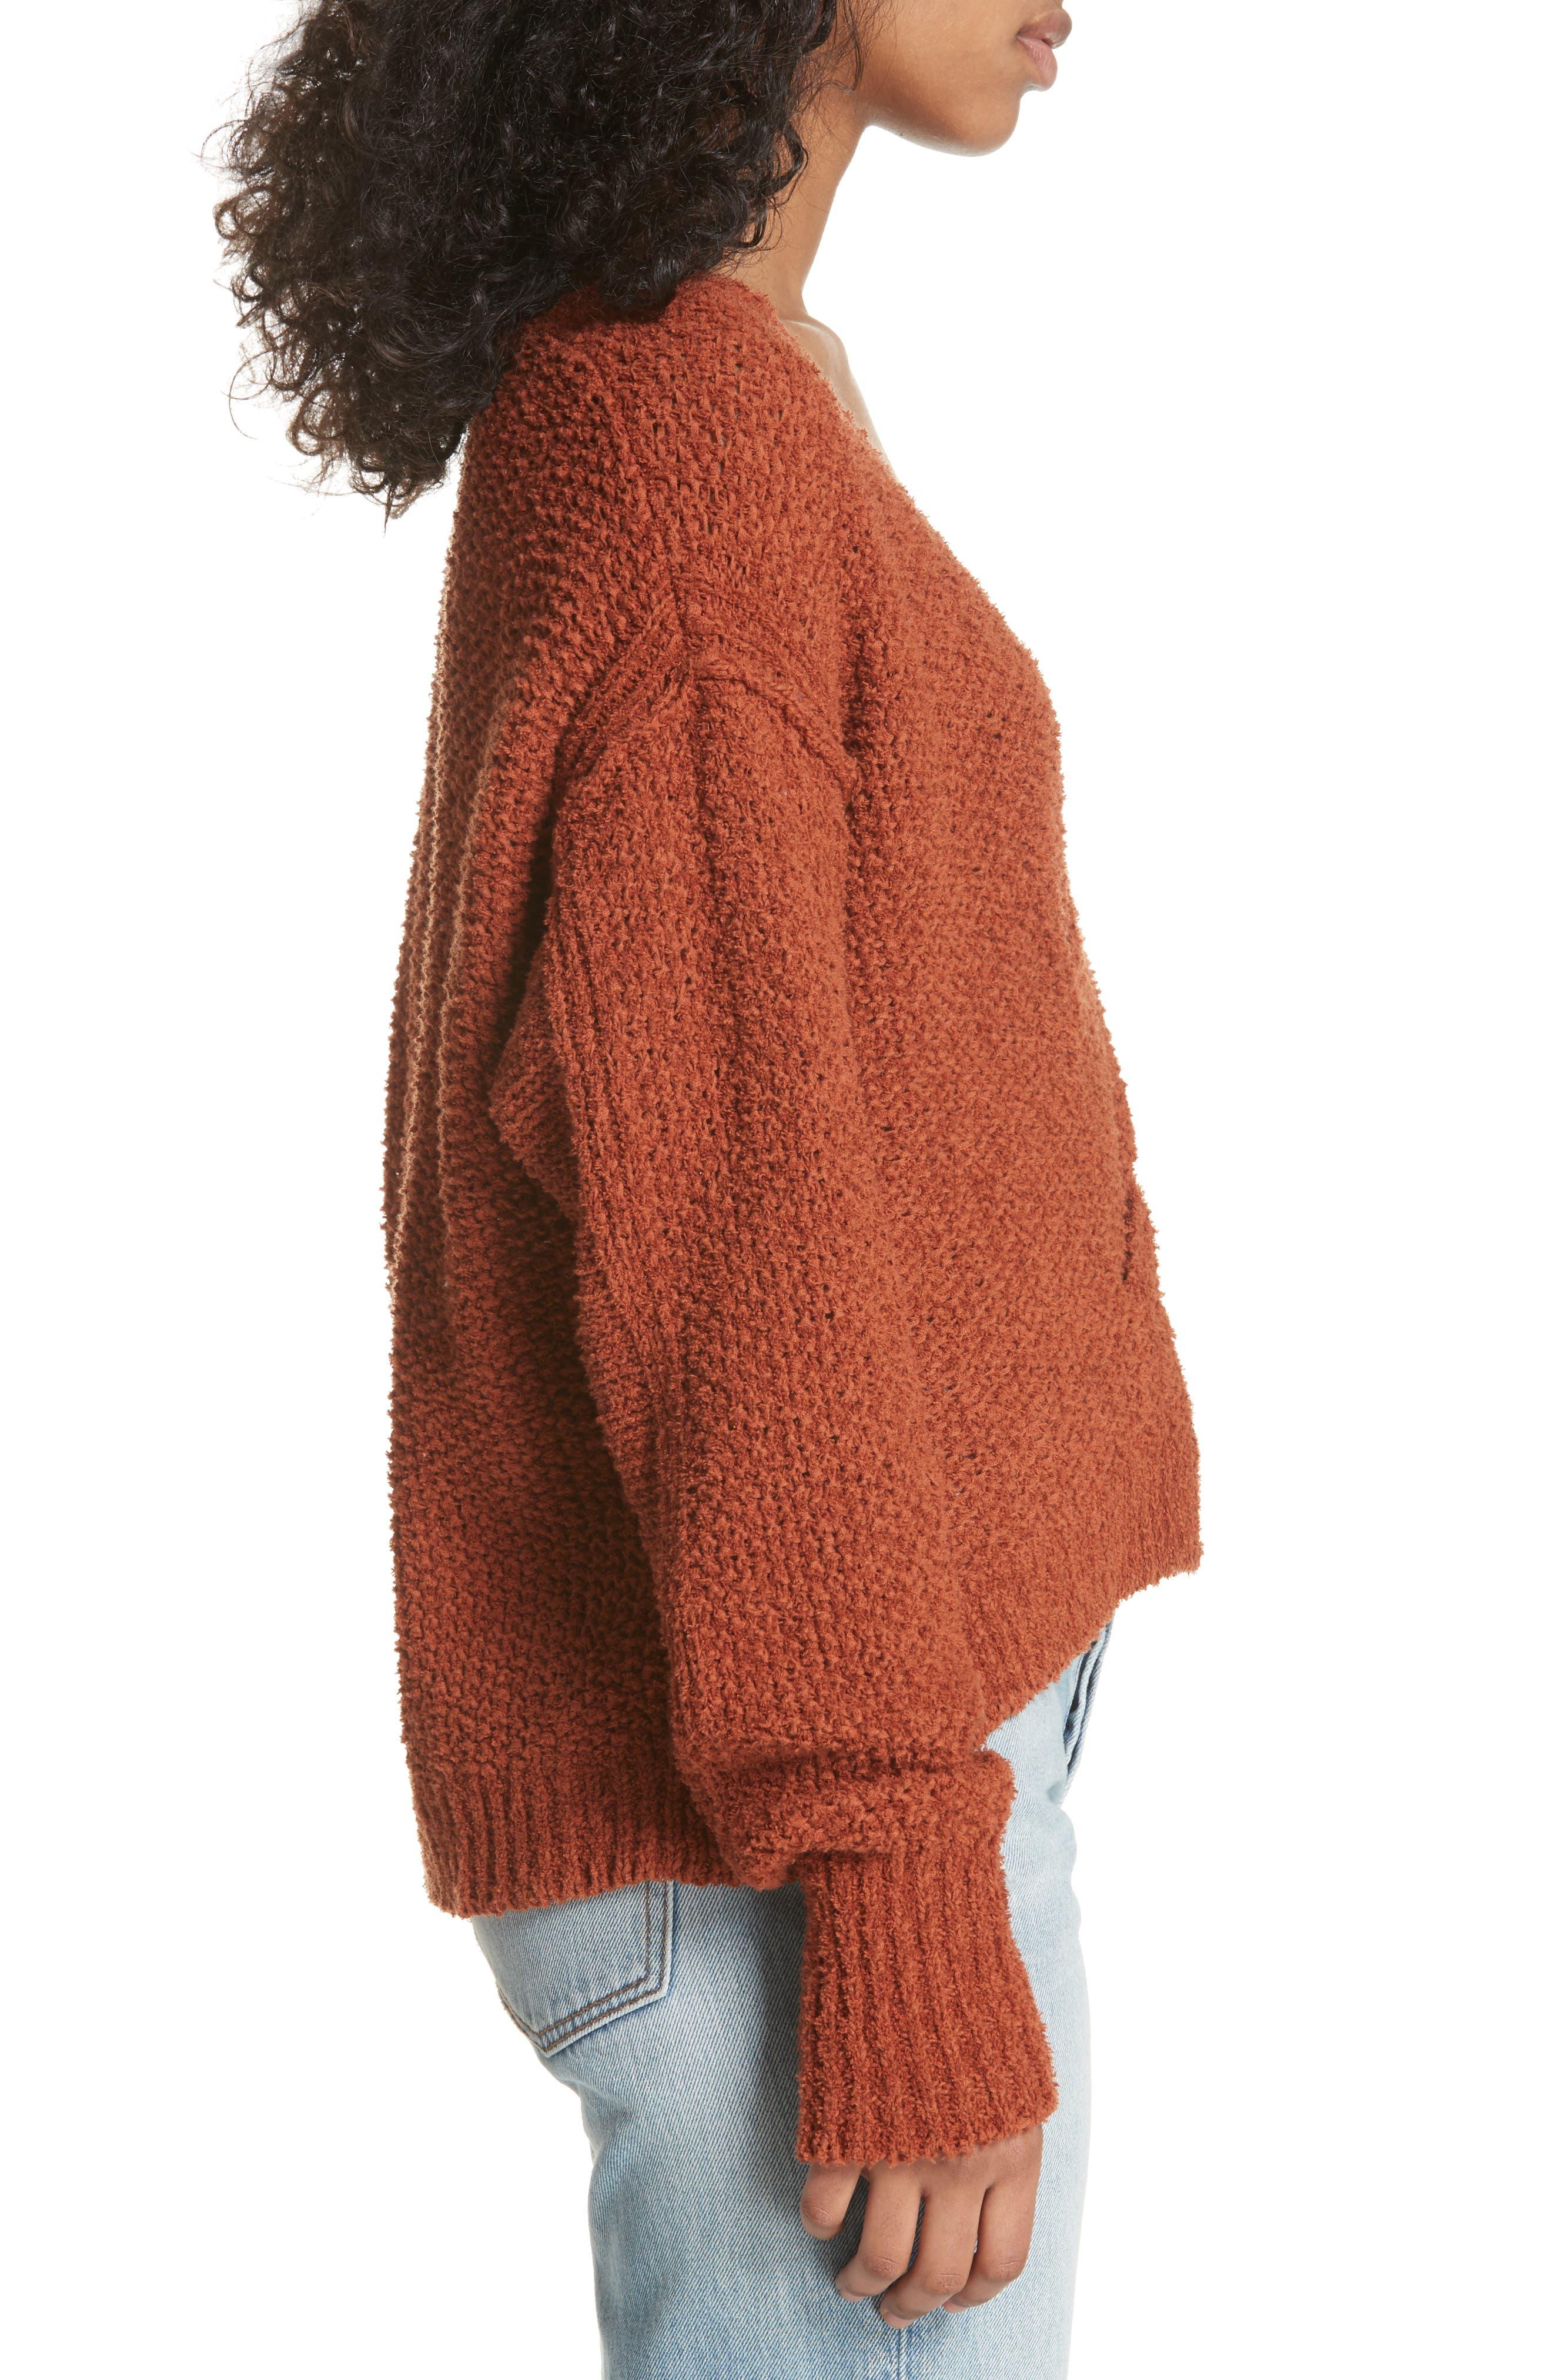 Coco V-Neck Sweater,                             Alternate thumbnail 3, color,                             Terracotta